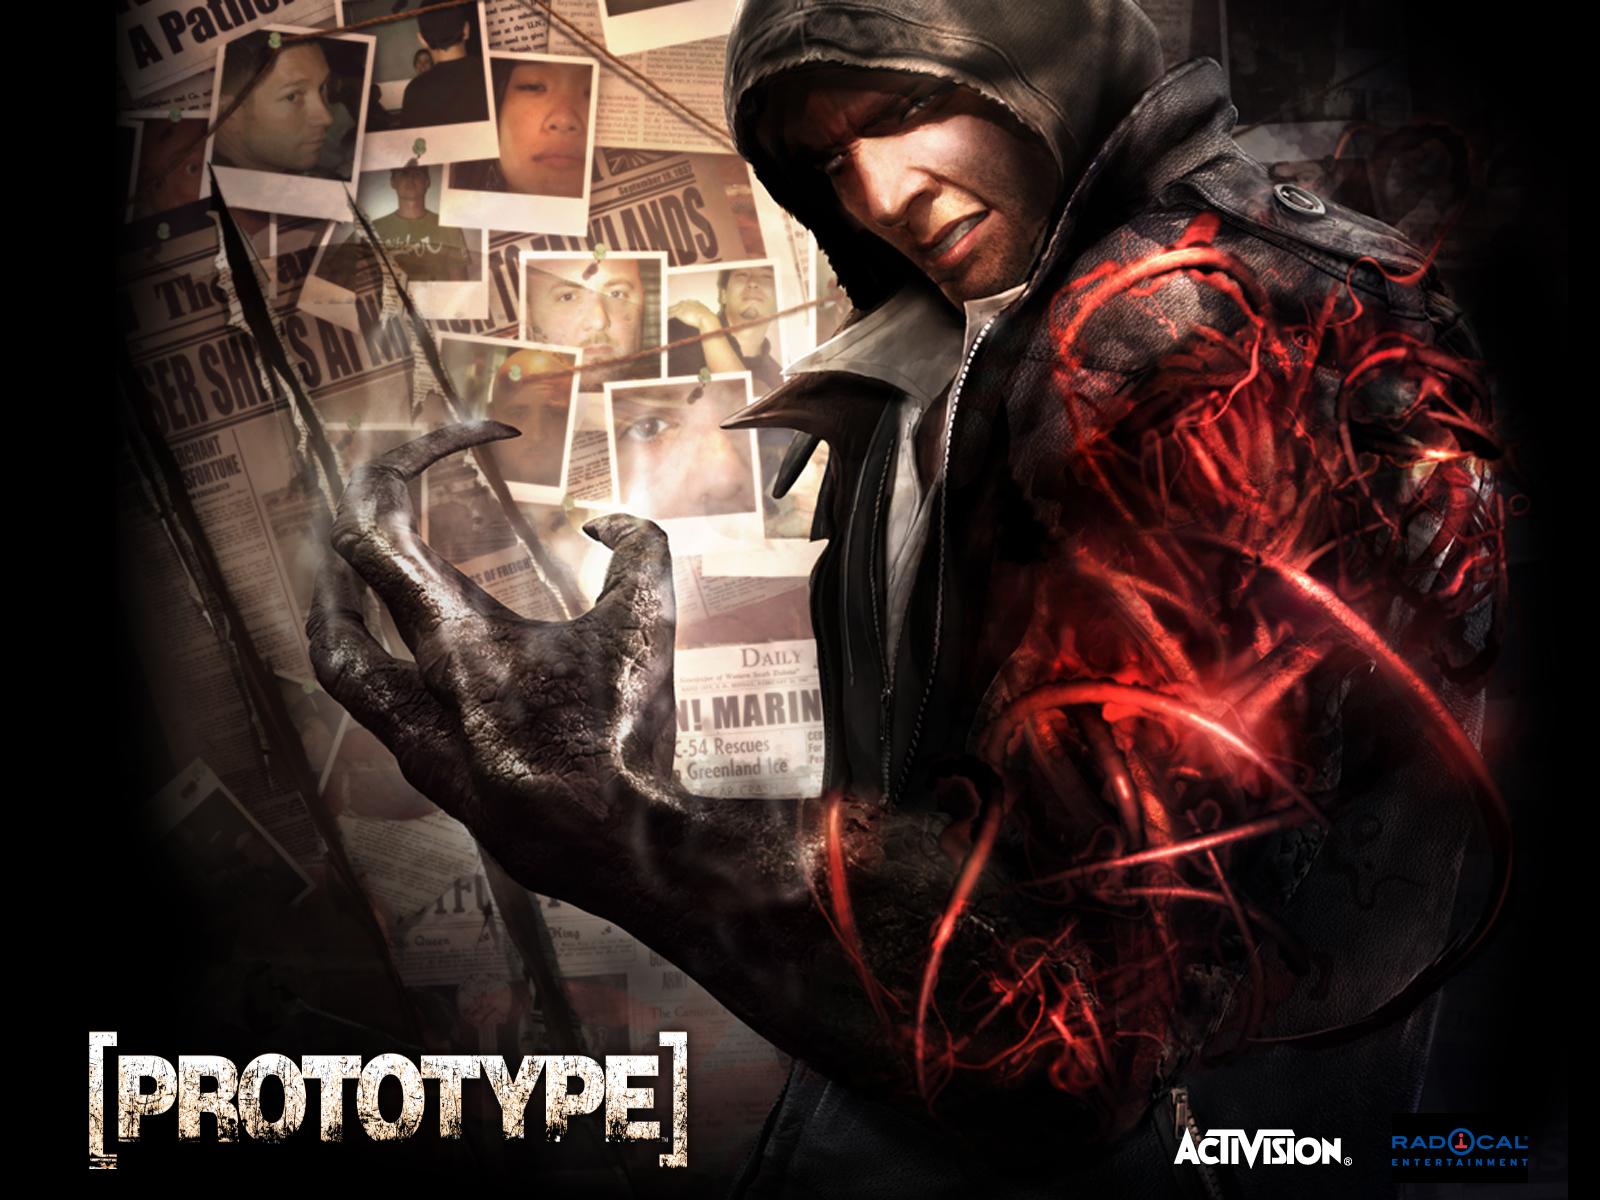 [Prototype]  (Radical/Activision, 2009)